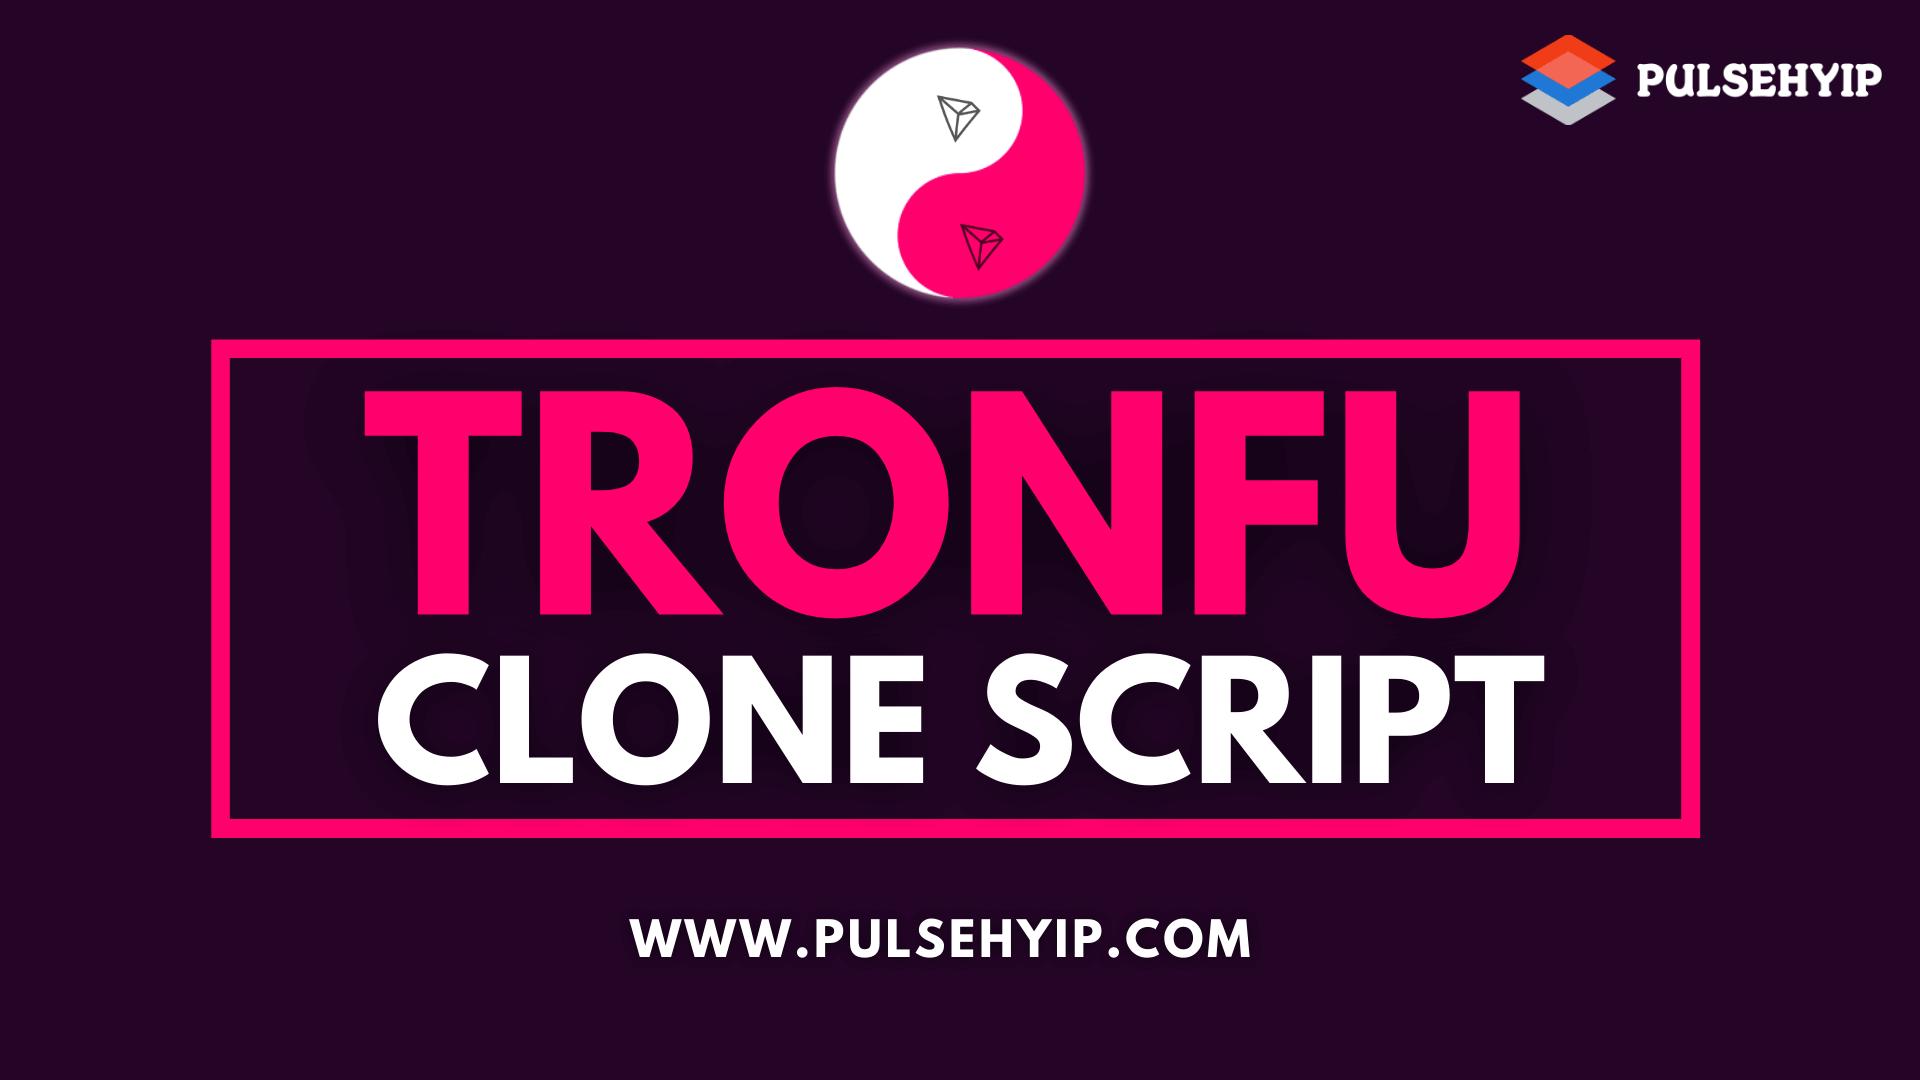 Tron Fu Clone Script to Launch TRON based Smart Contract HYIP like Tron Fu